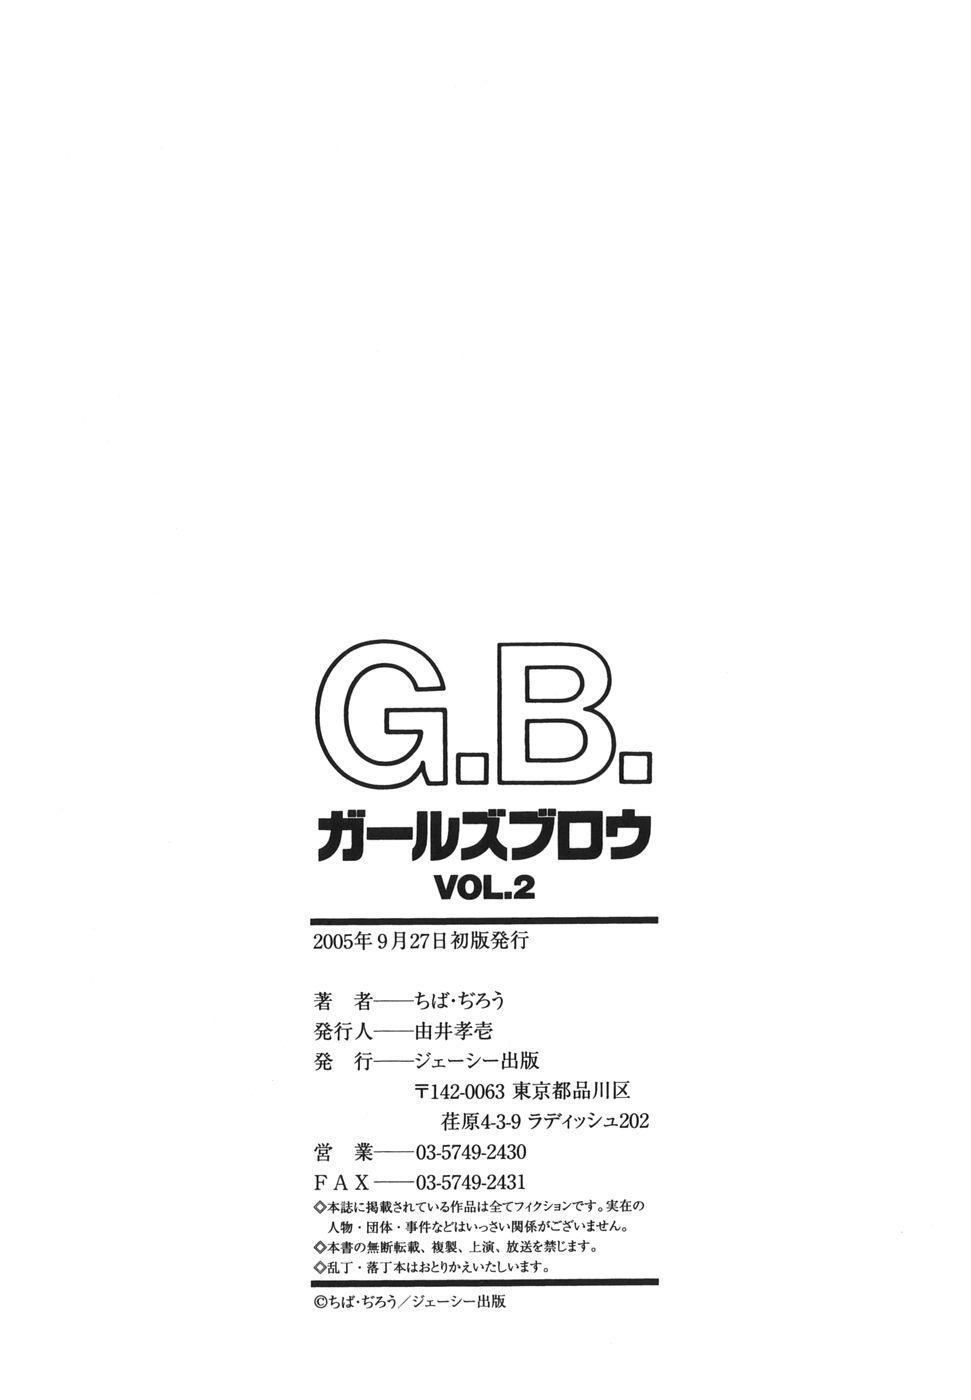 G.B. Girls Blow 2 211